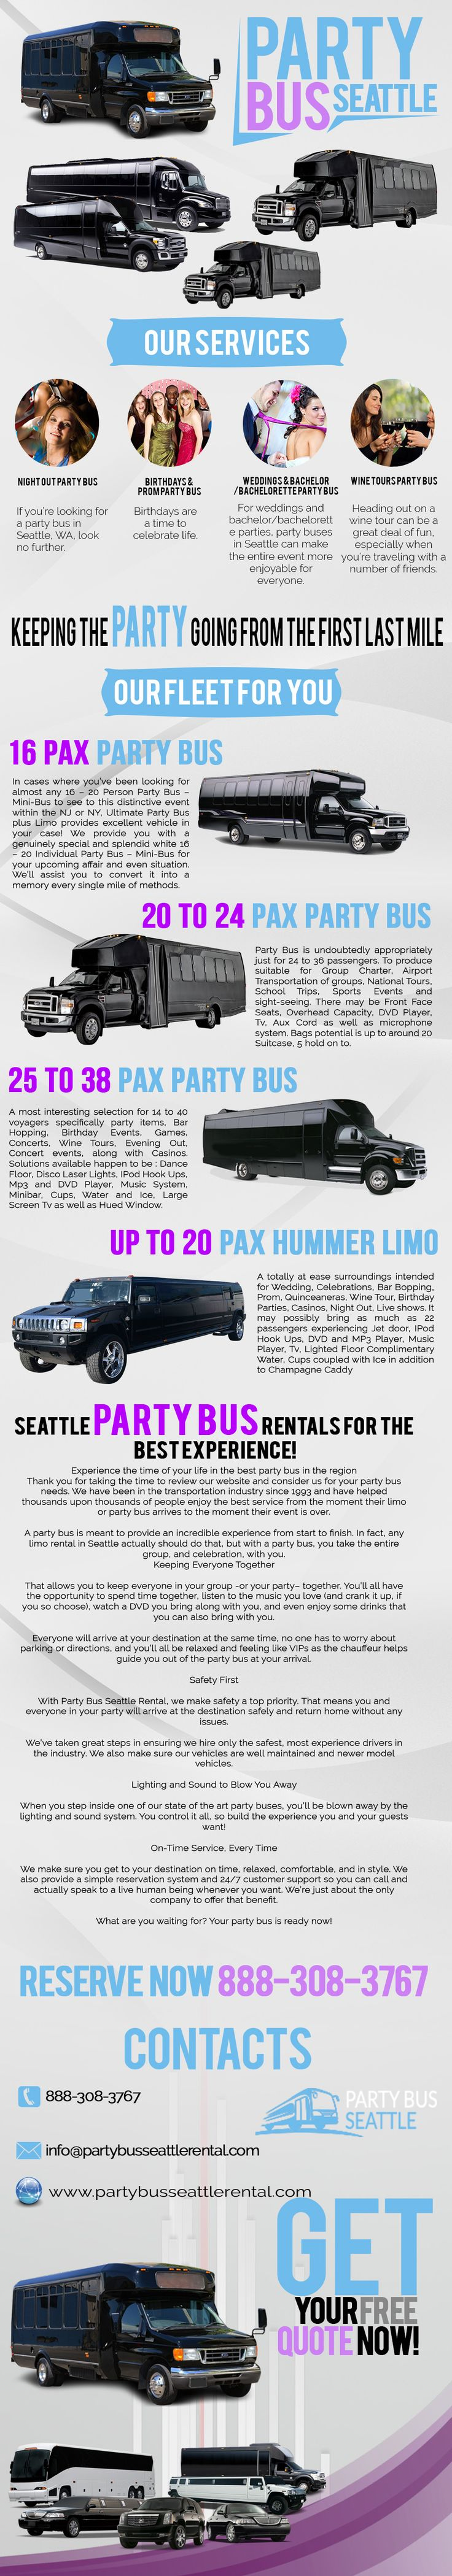 Best 25 Party bus rental ideas on Pinterest